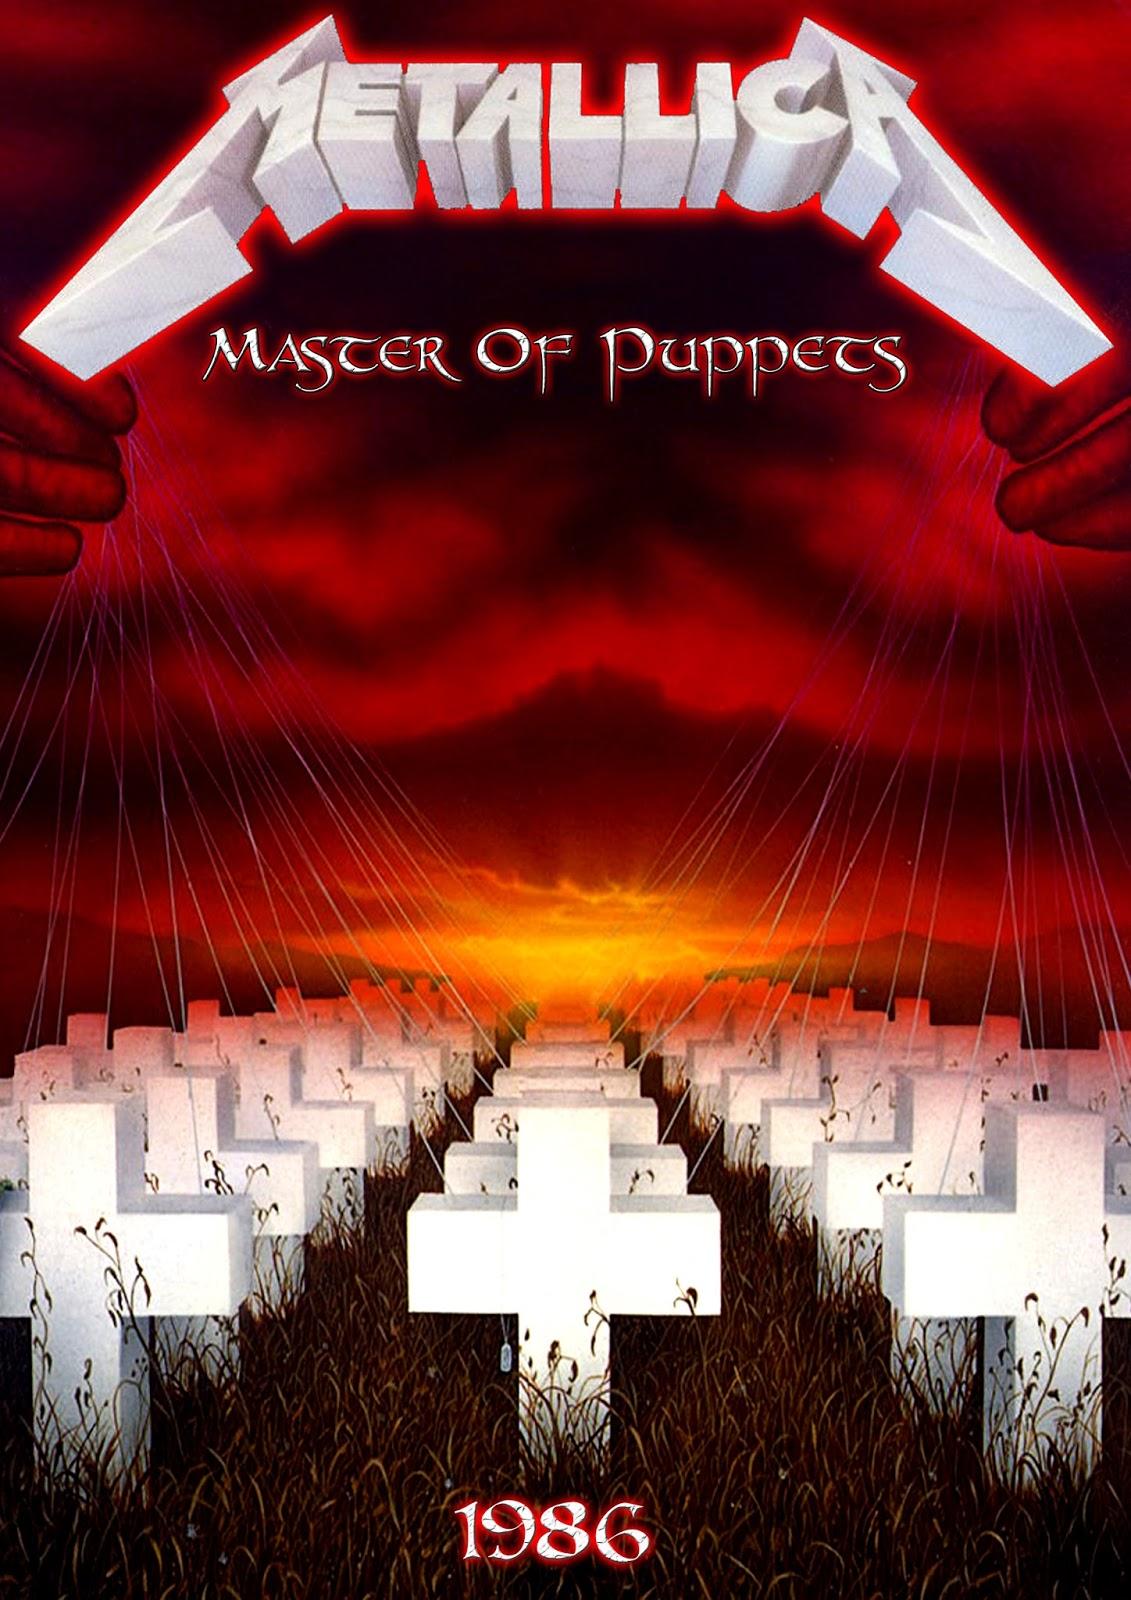 Metallica Master Of Puppets Wallpaper Metallica Master Of